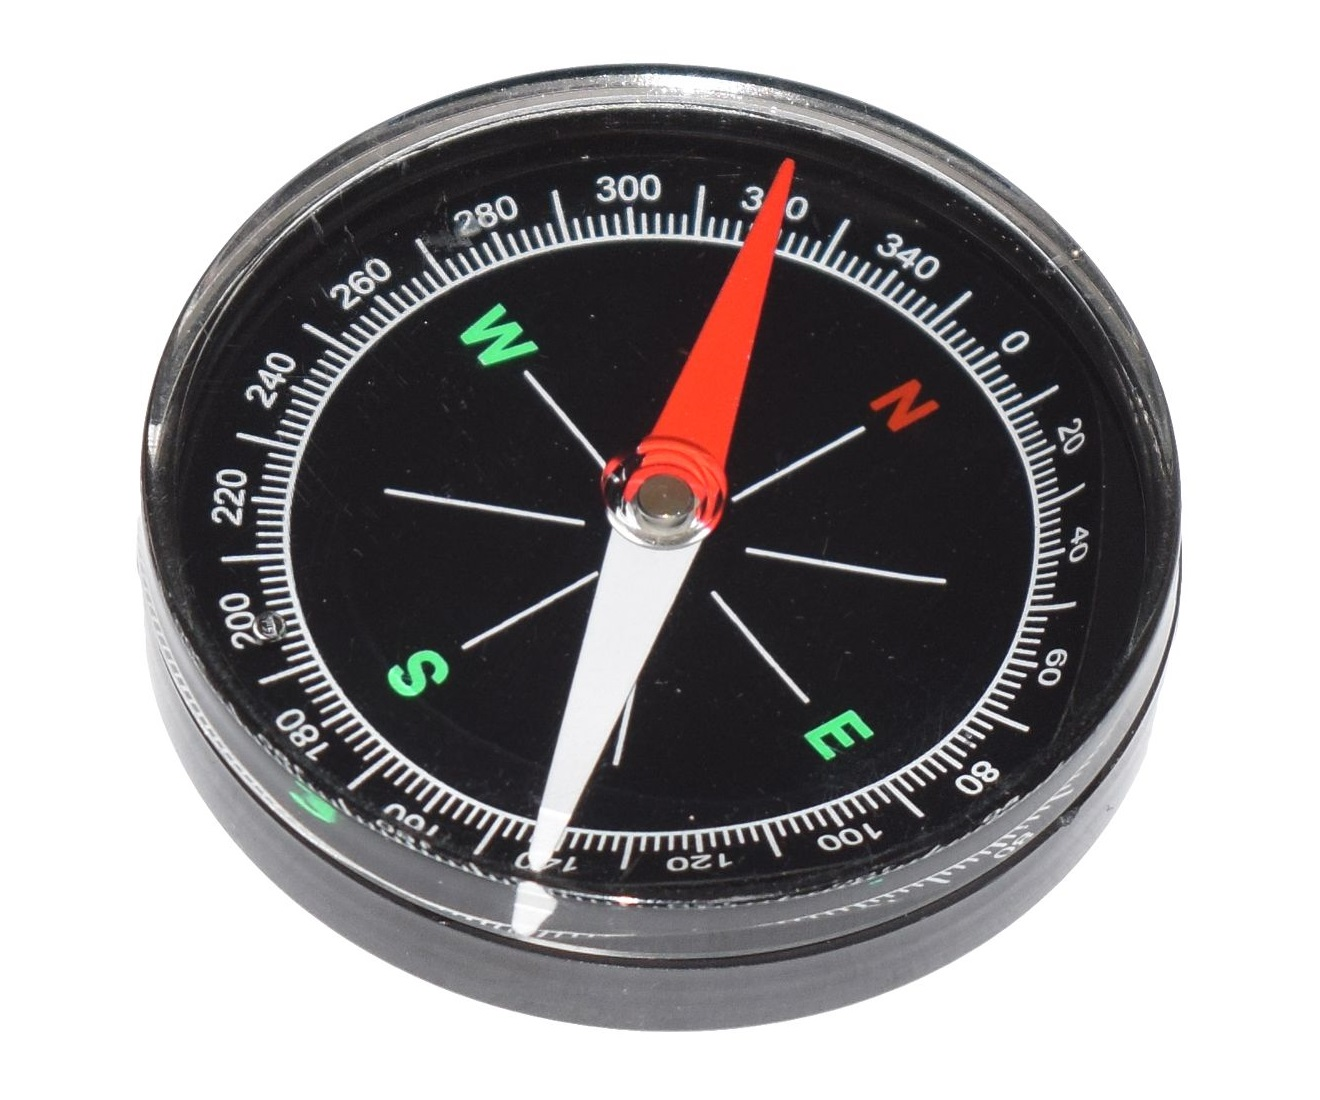 компас модель по картинке фото отчёта